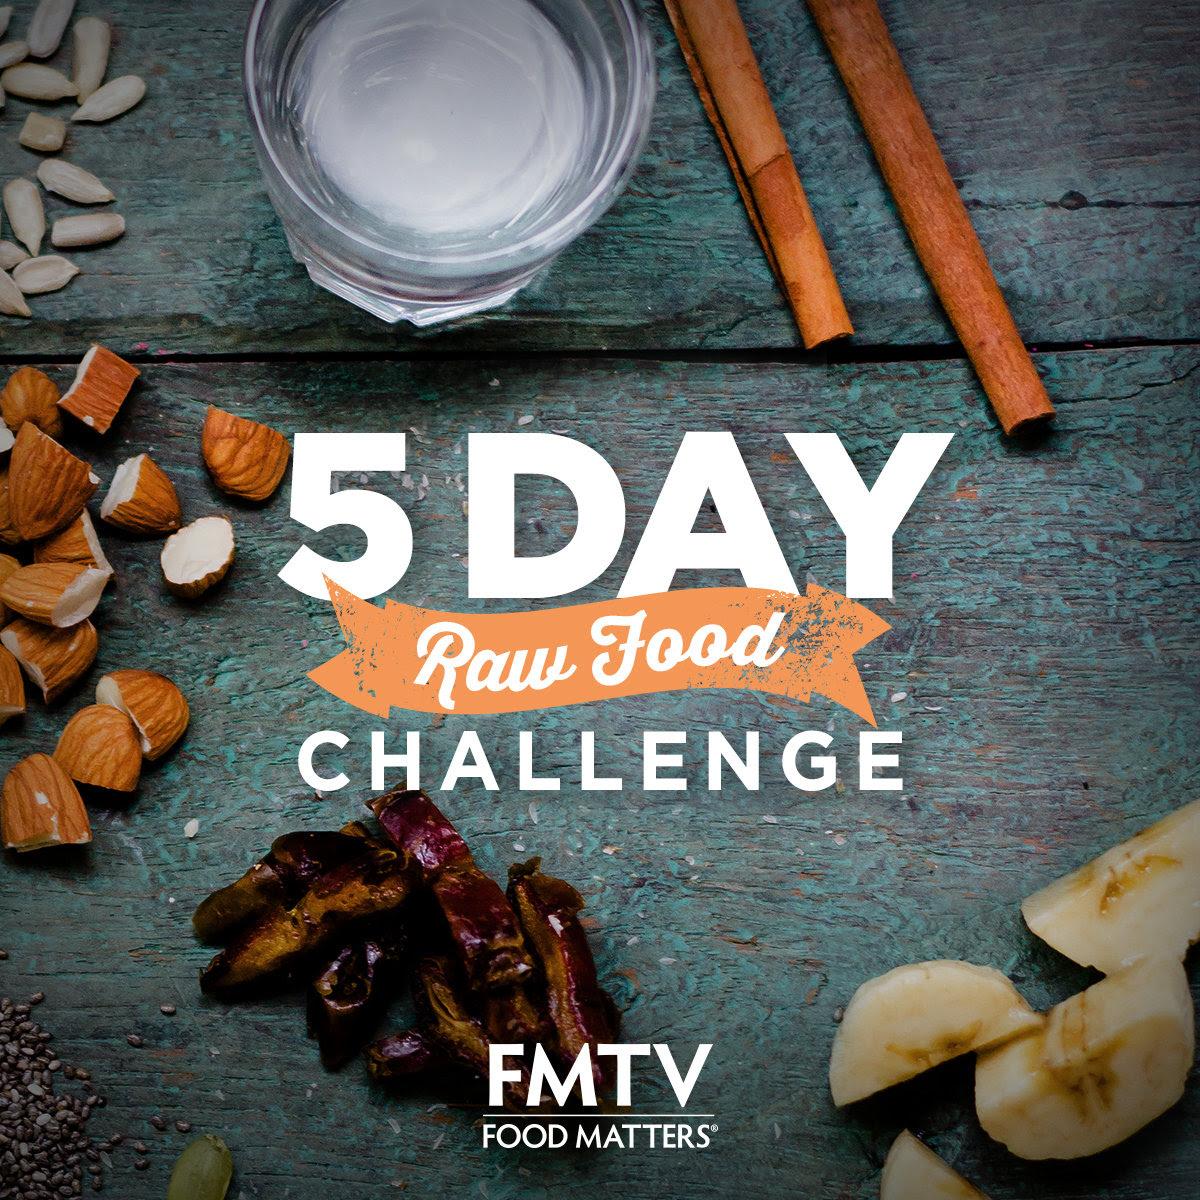 fmtv challenge.jpg